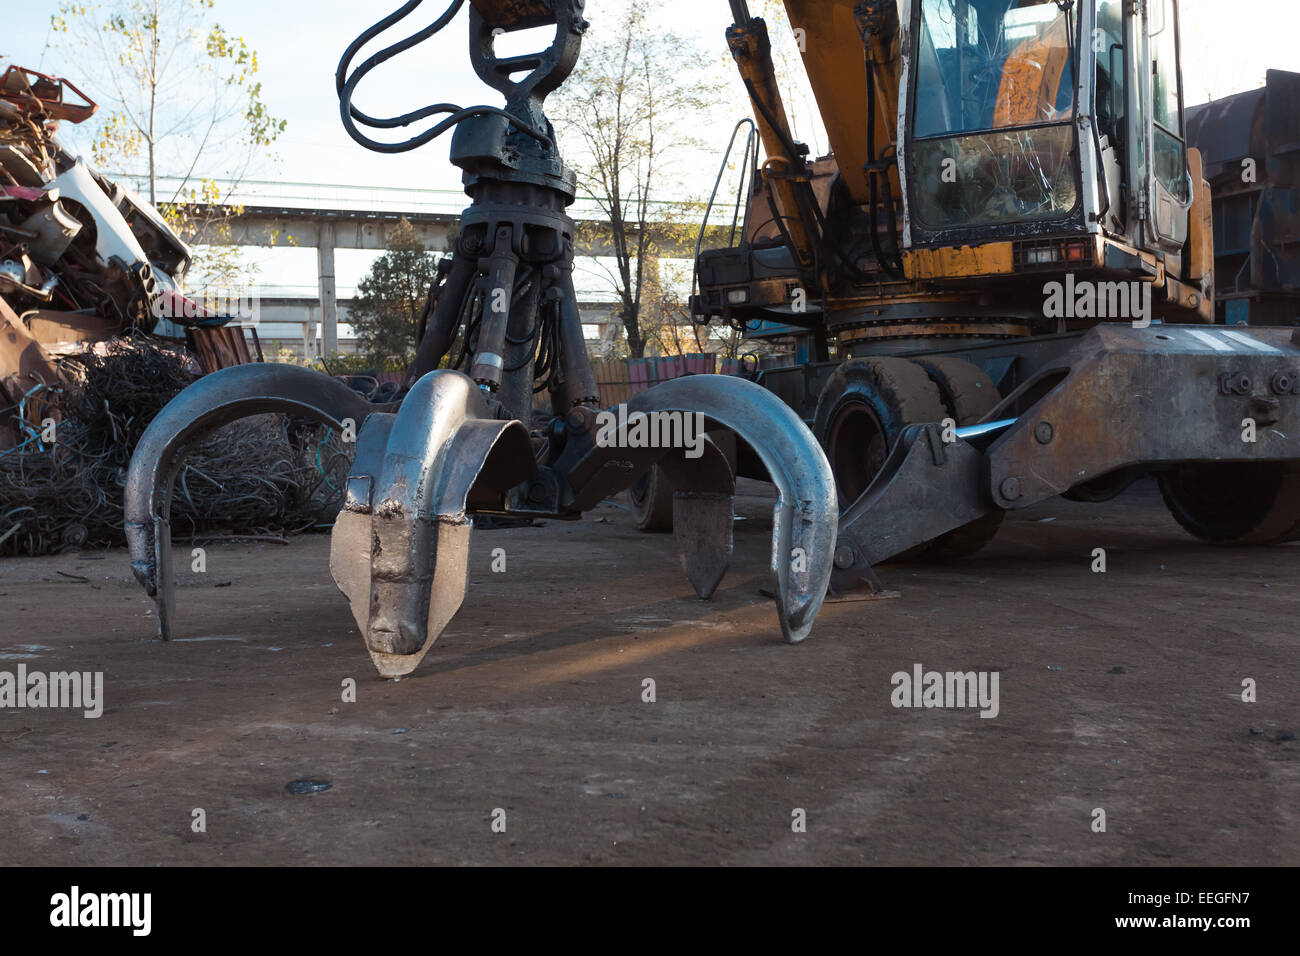 claw crane heavy machinery equipment - Stock Image